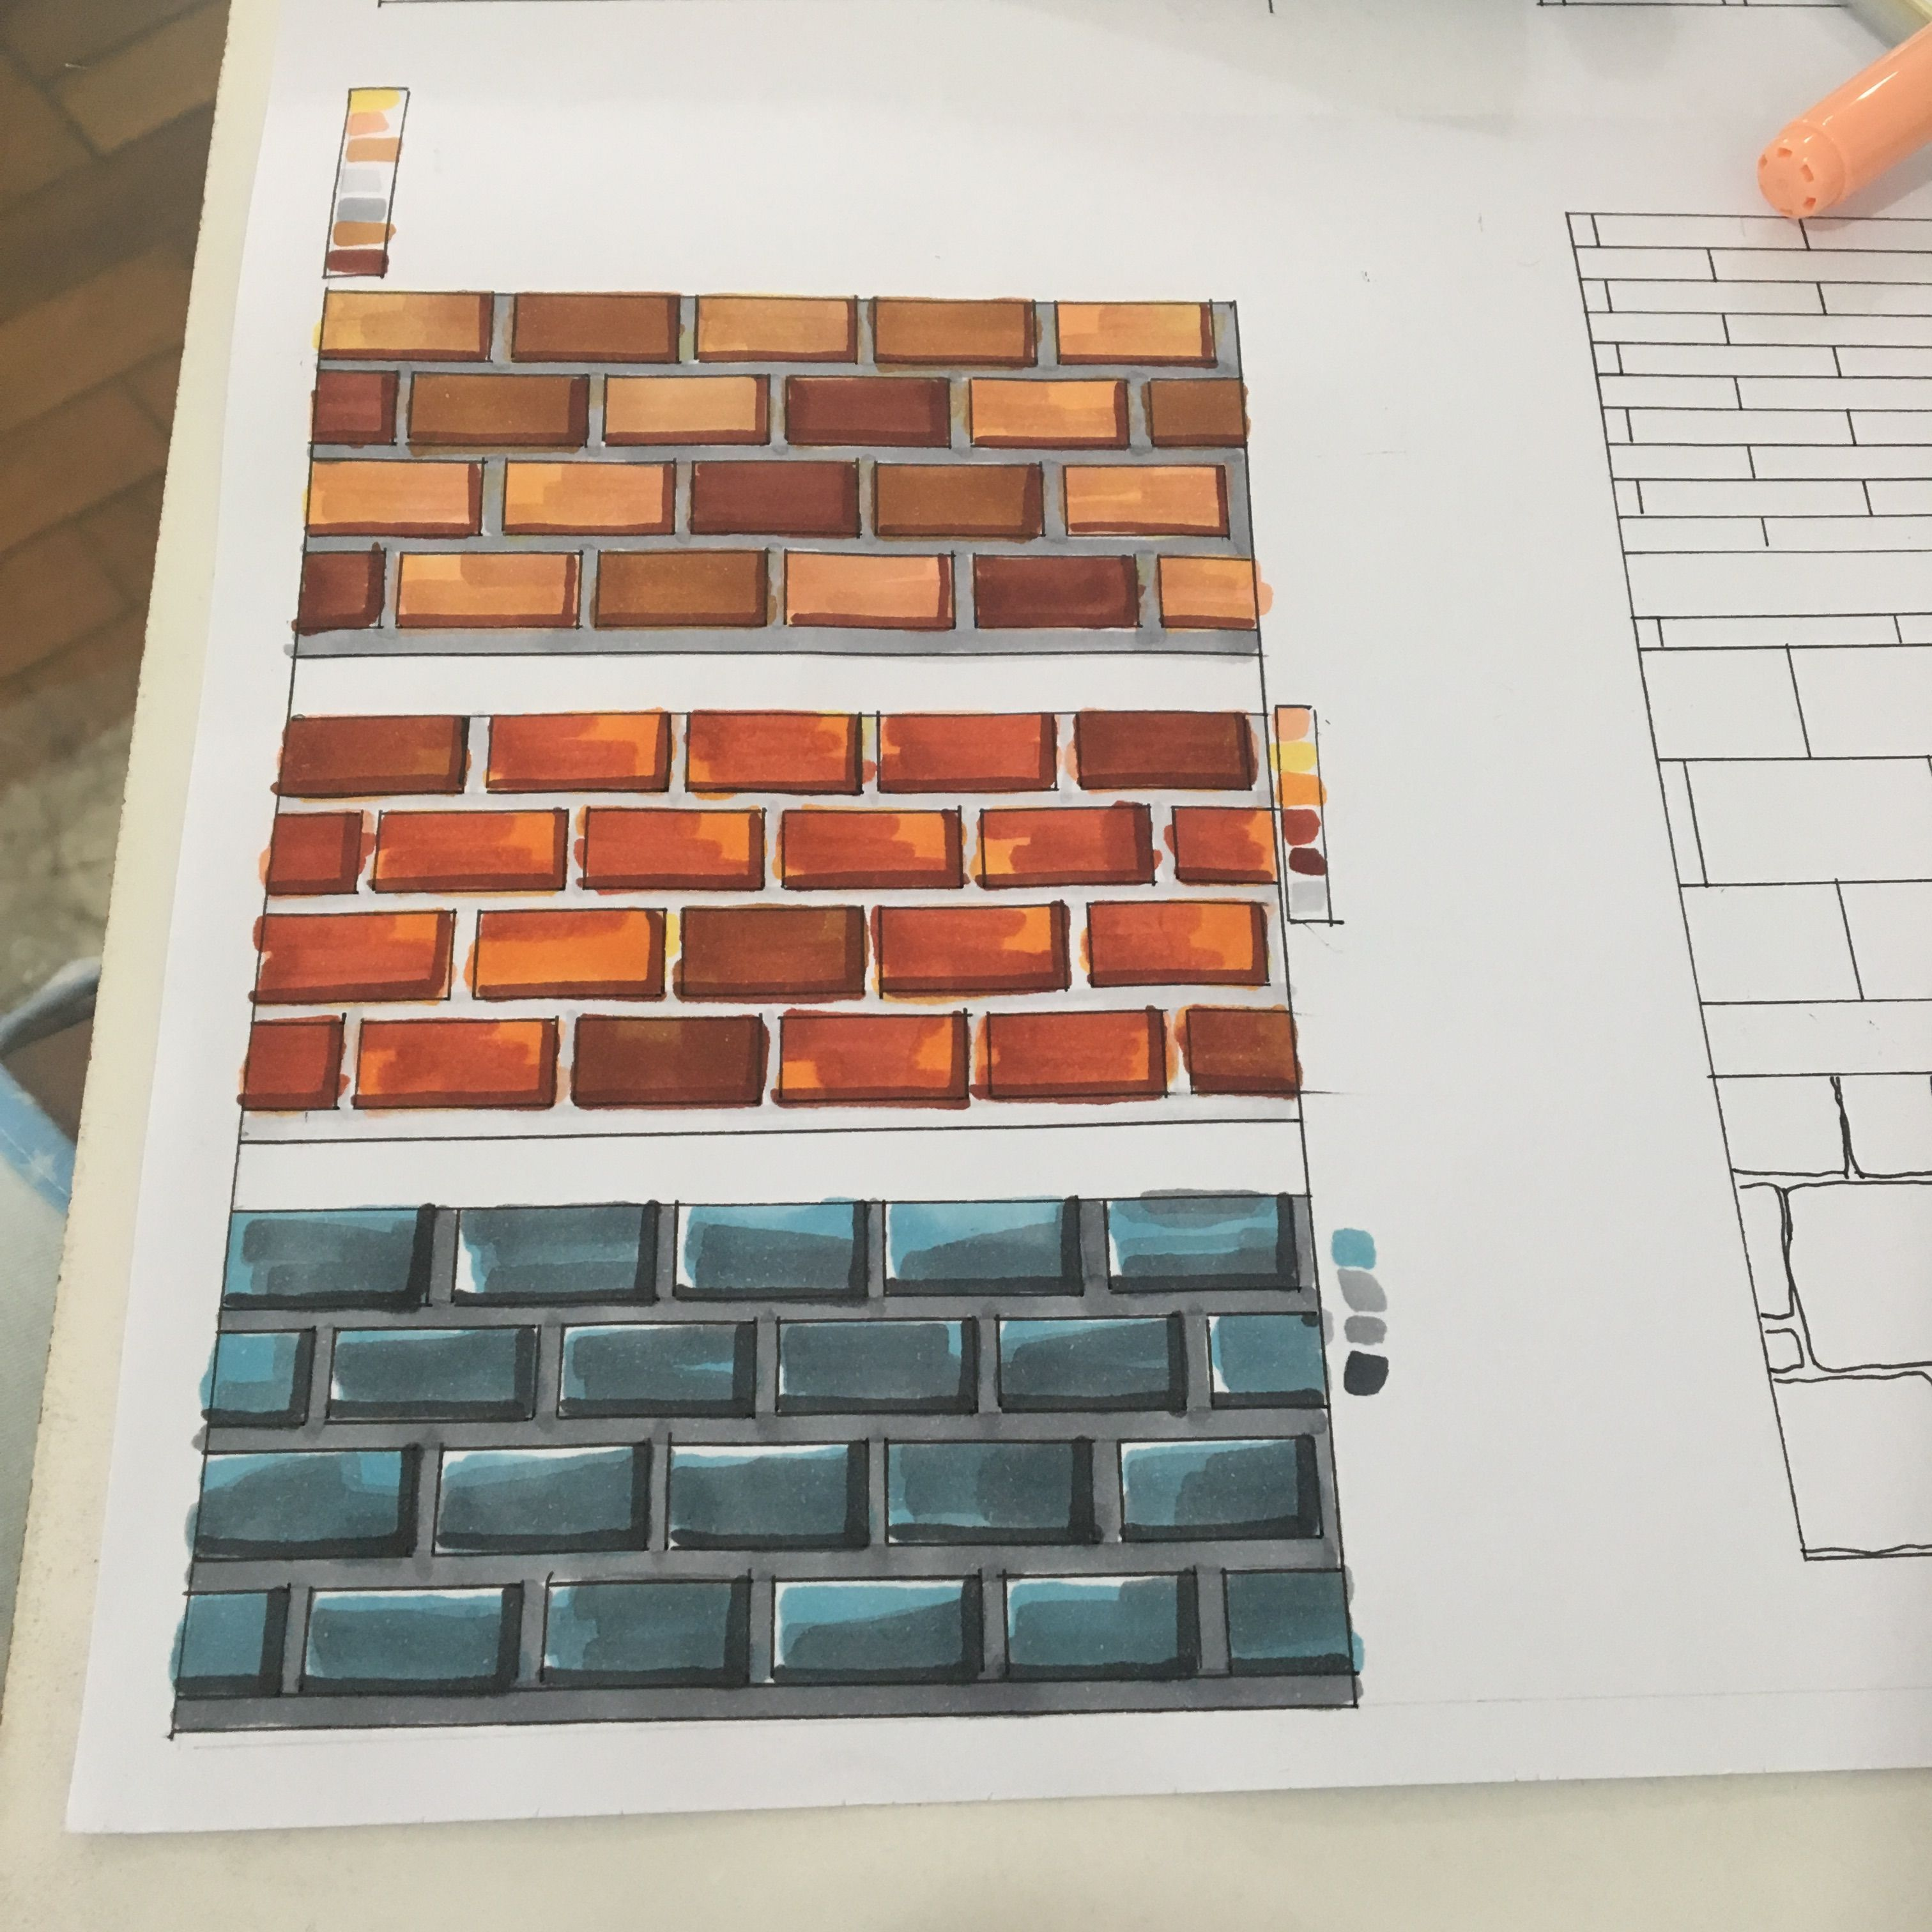 21 Innenarchitektur Mappe Ideen in 2121   innenarchitektur ...